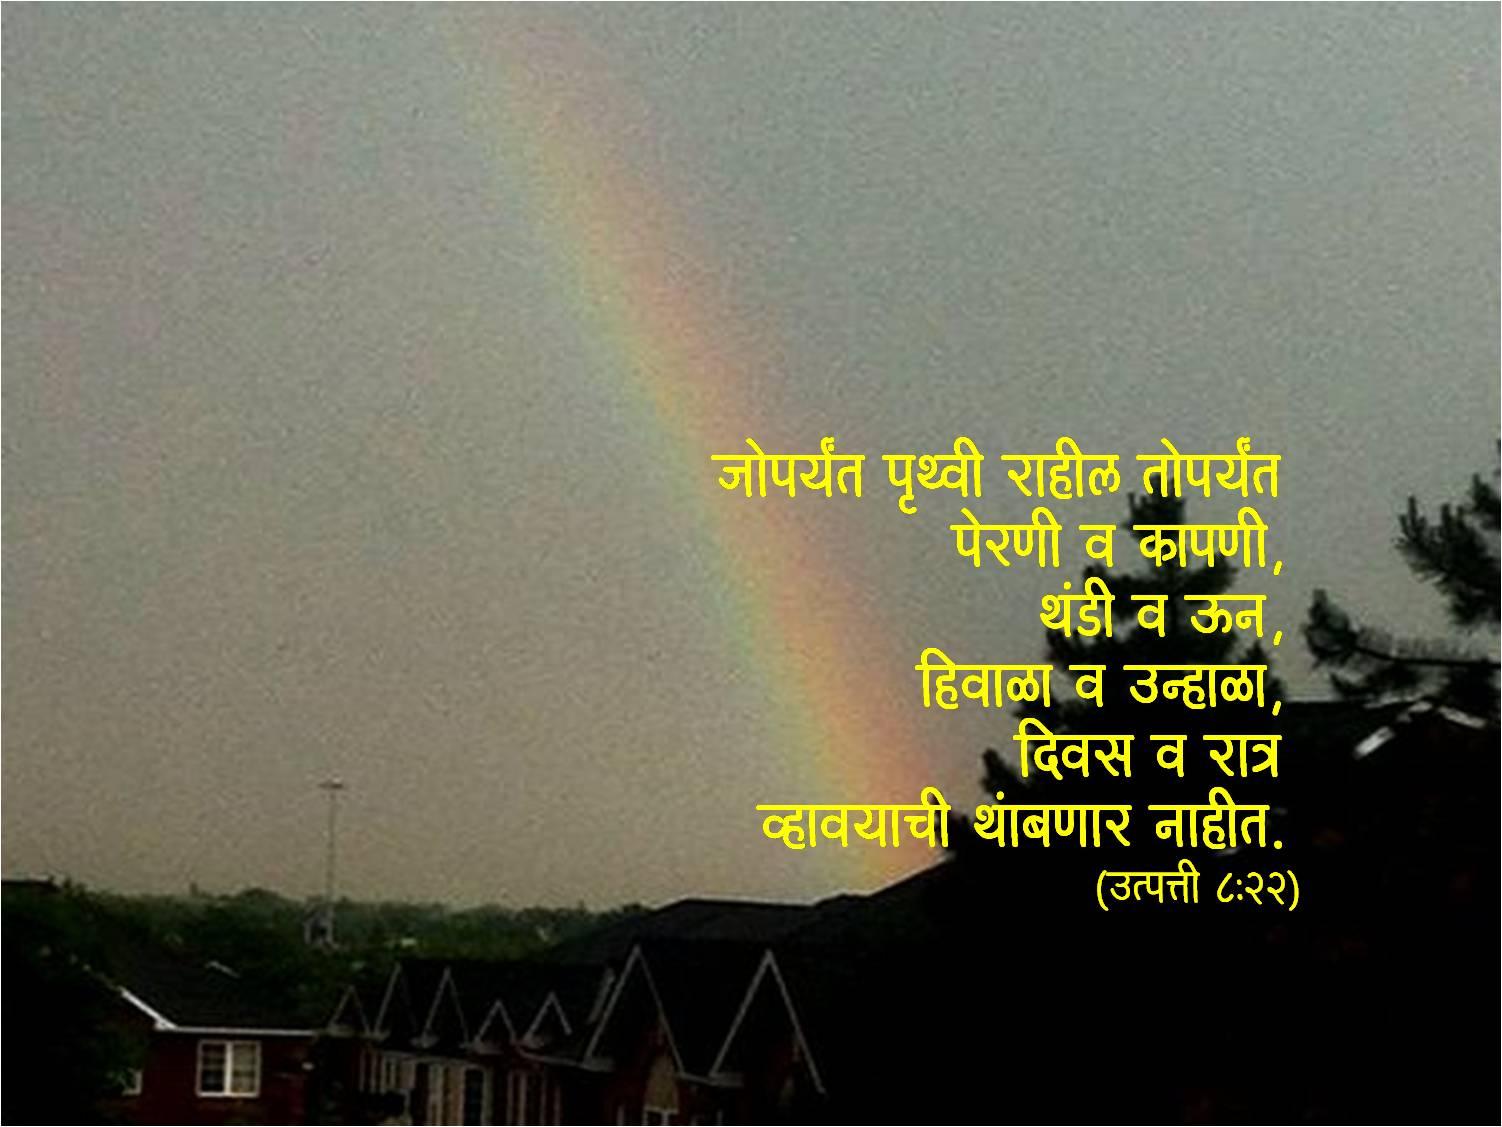 Marathi Bible Wallpaper (Genesis 8:22) | Nava Karar ...